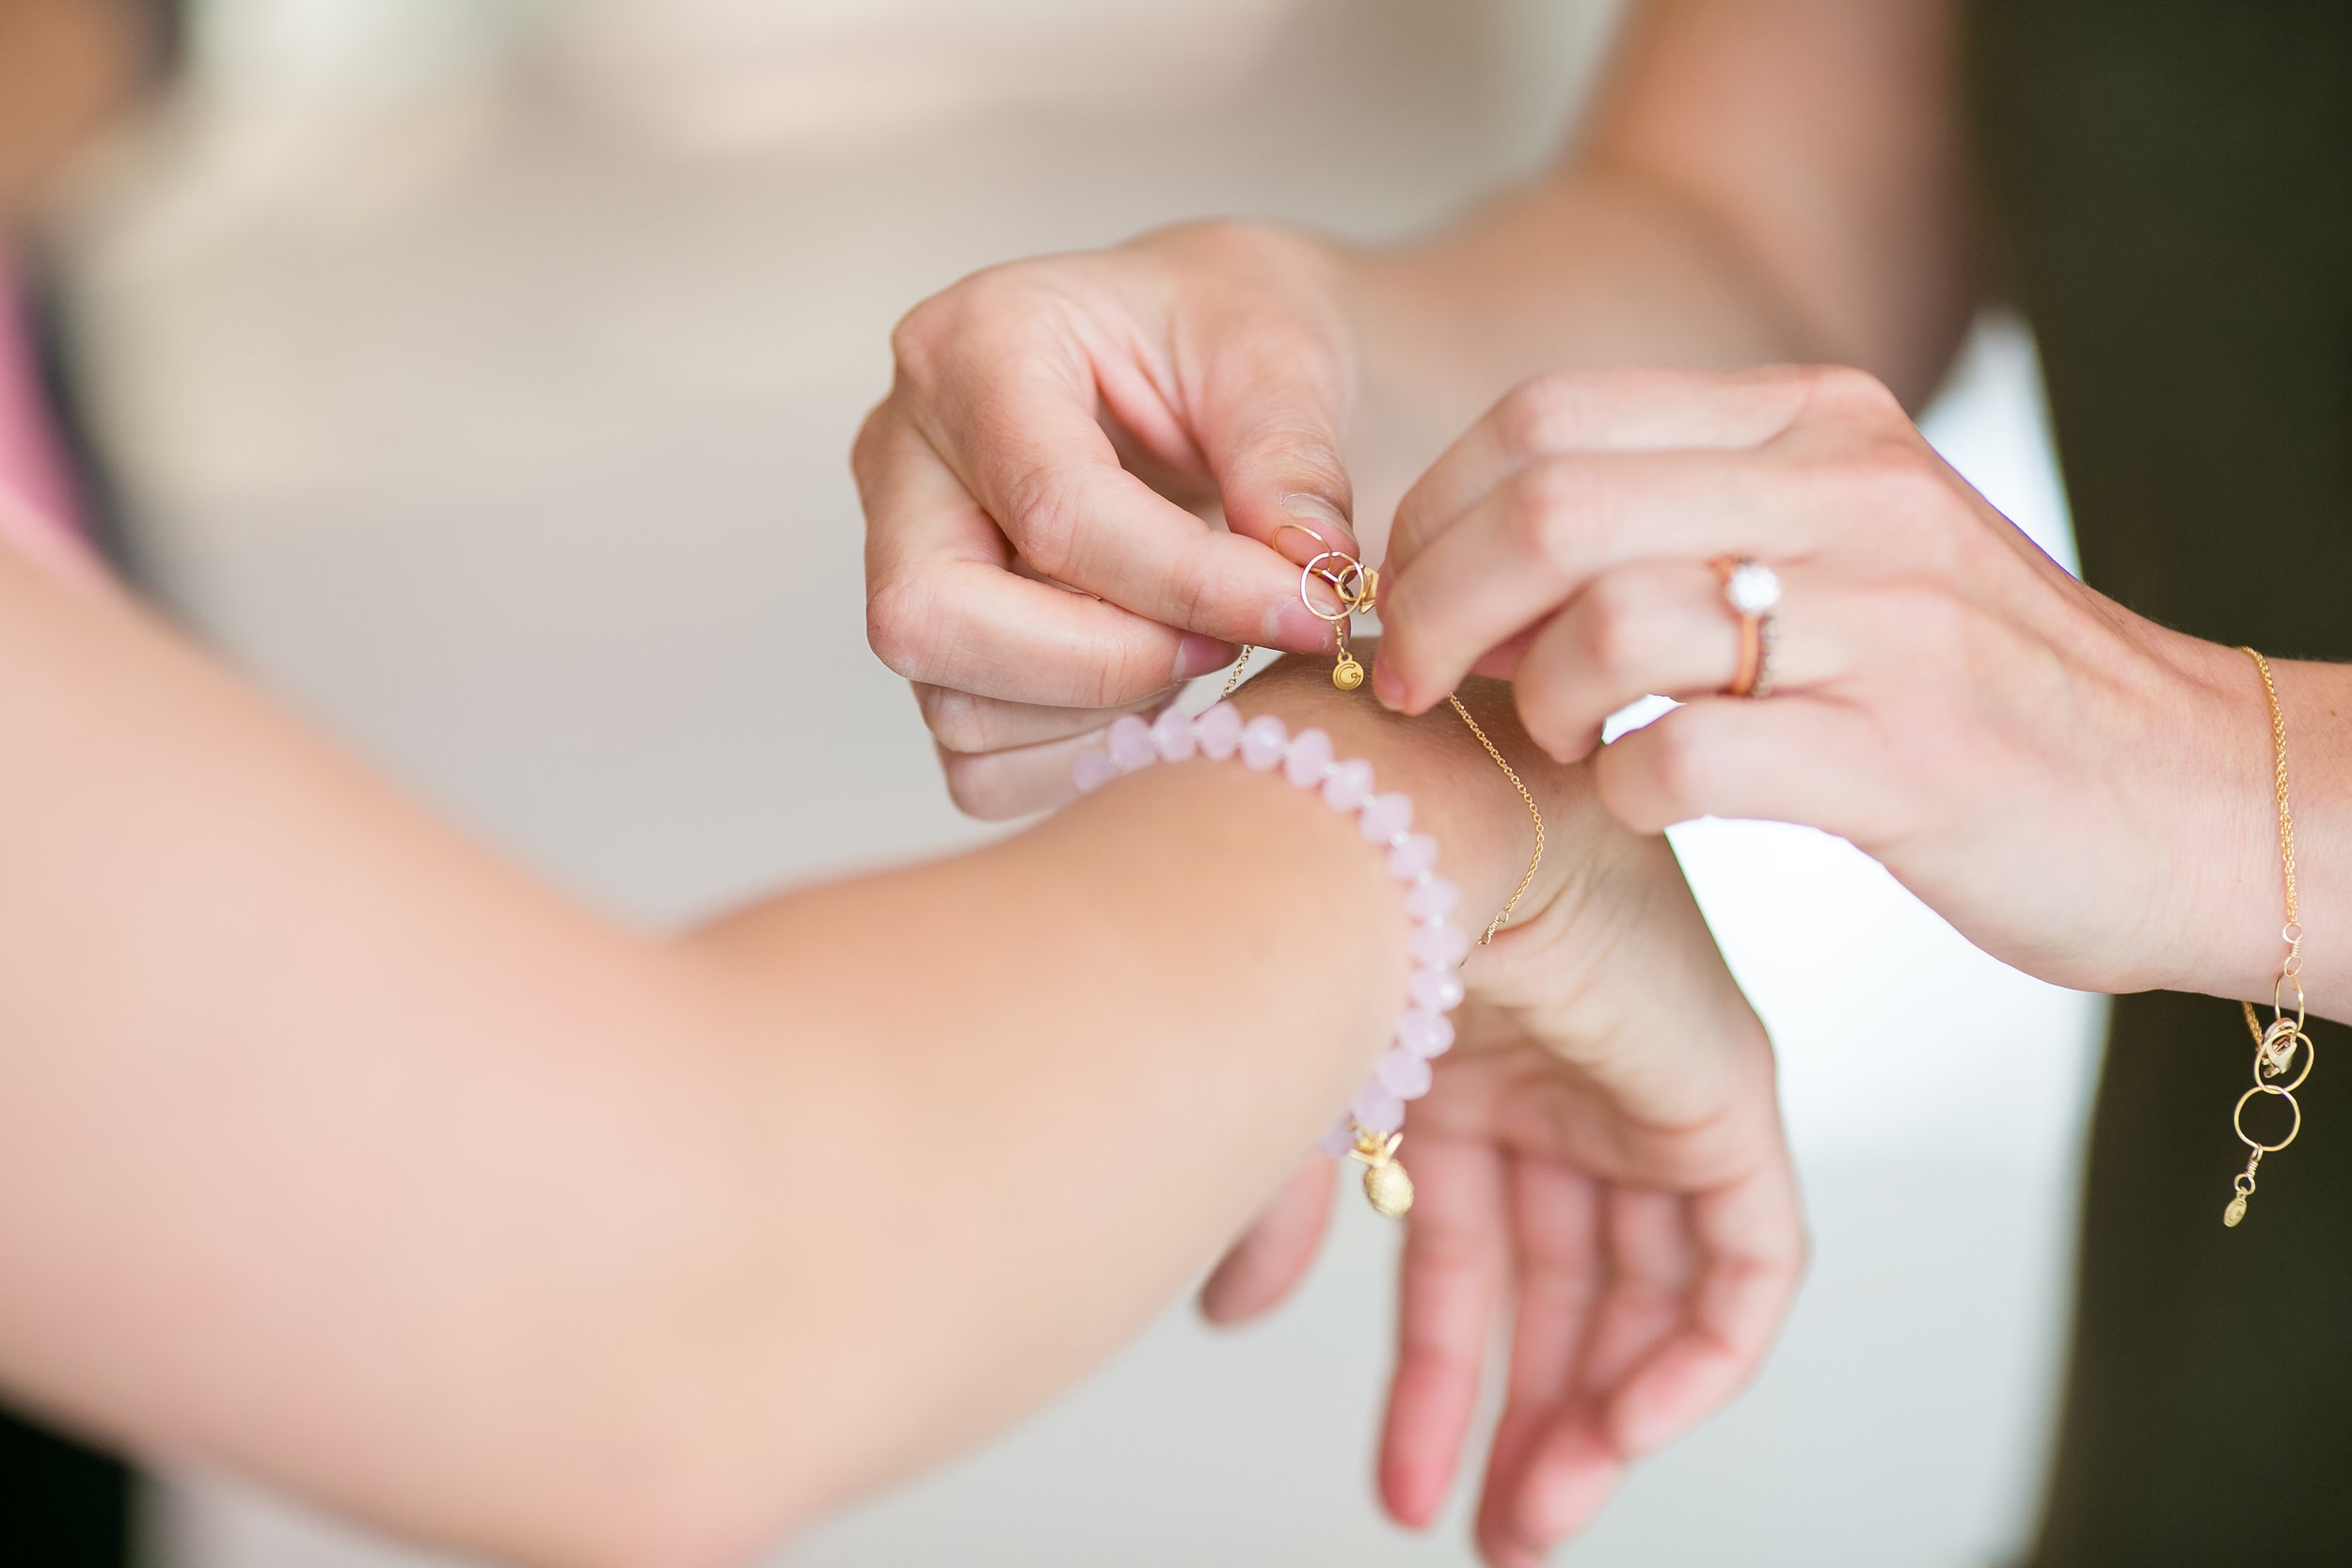 bridesmaids bracelets   Goldfine Jewelry   Jeannine Marie Minnesota Photographer for weddings